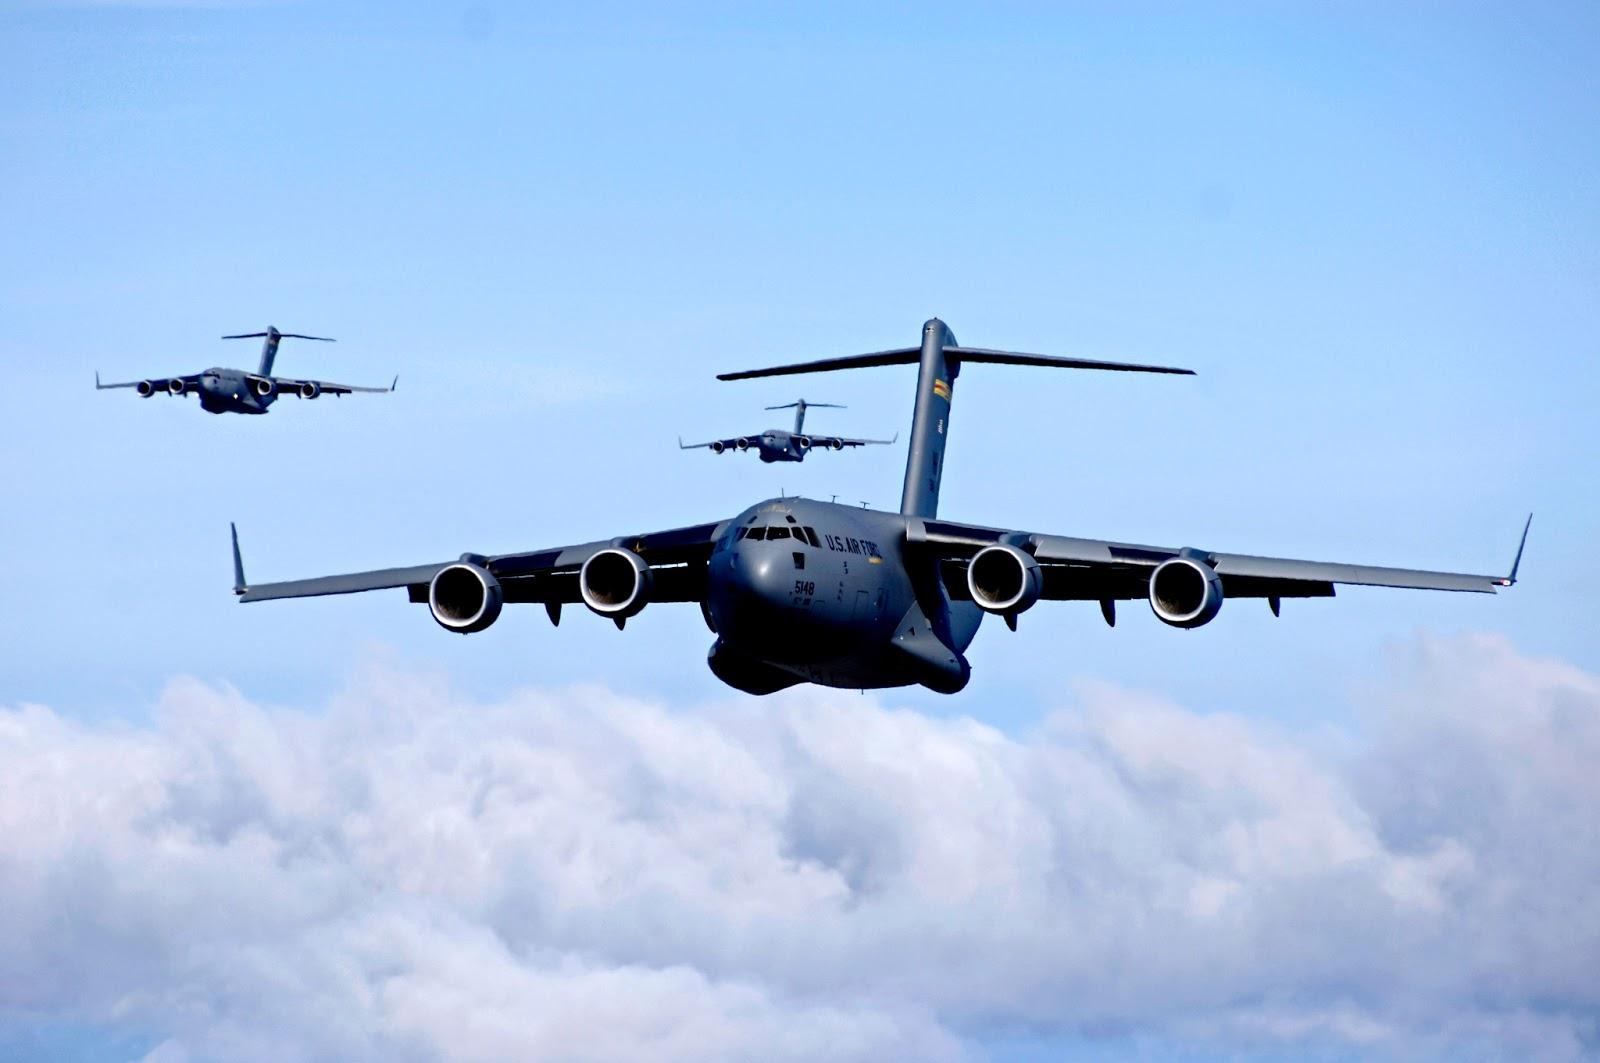 C-17 Globemaster IIIs